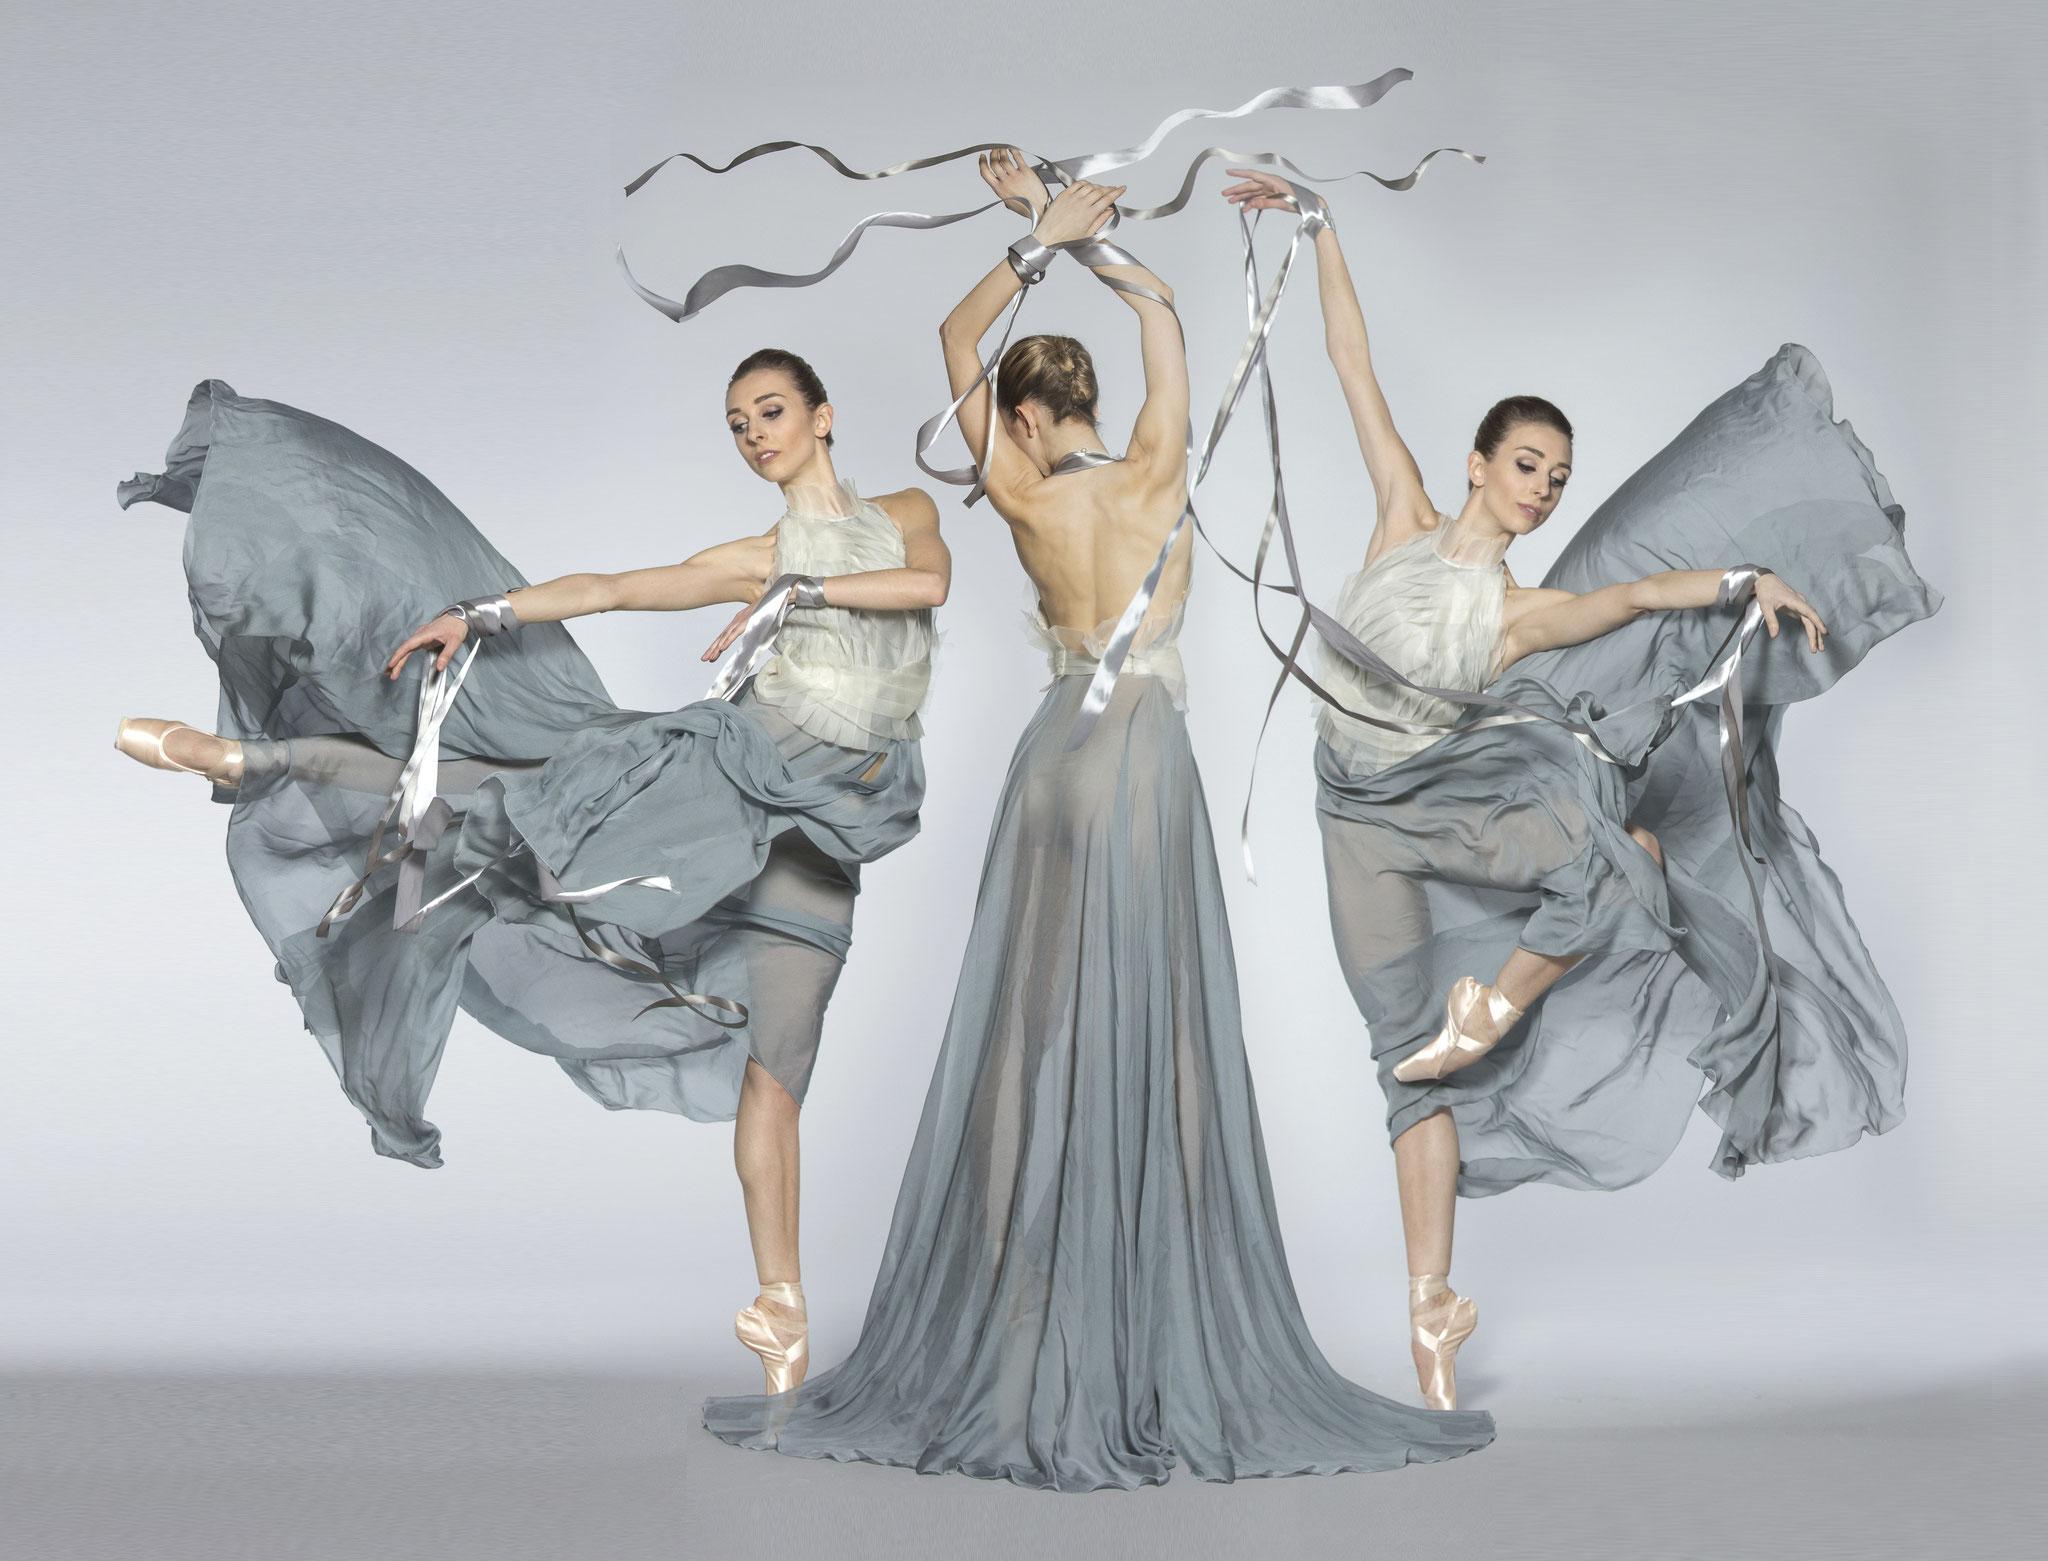 Egressy Orsolya (Hungary - Butterfly dance